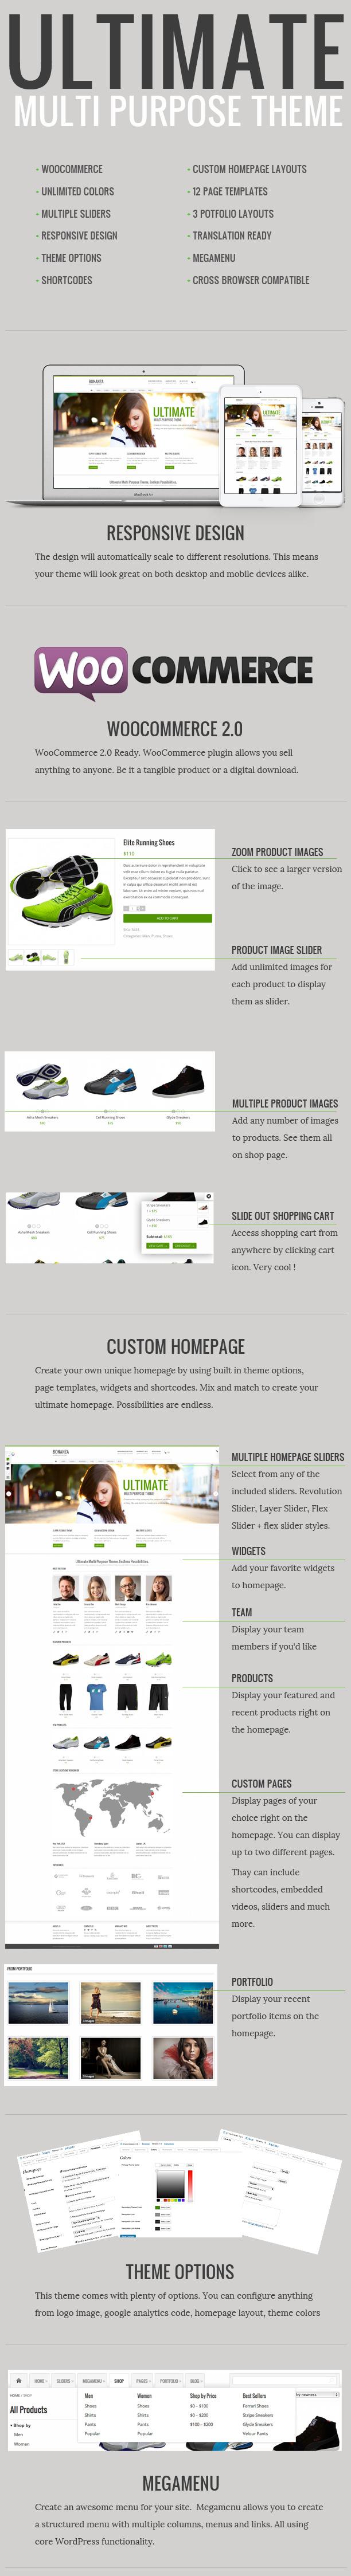 bonanza2 - Bonanza - Responsive Multi-Purpose WordPress Theme